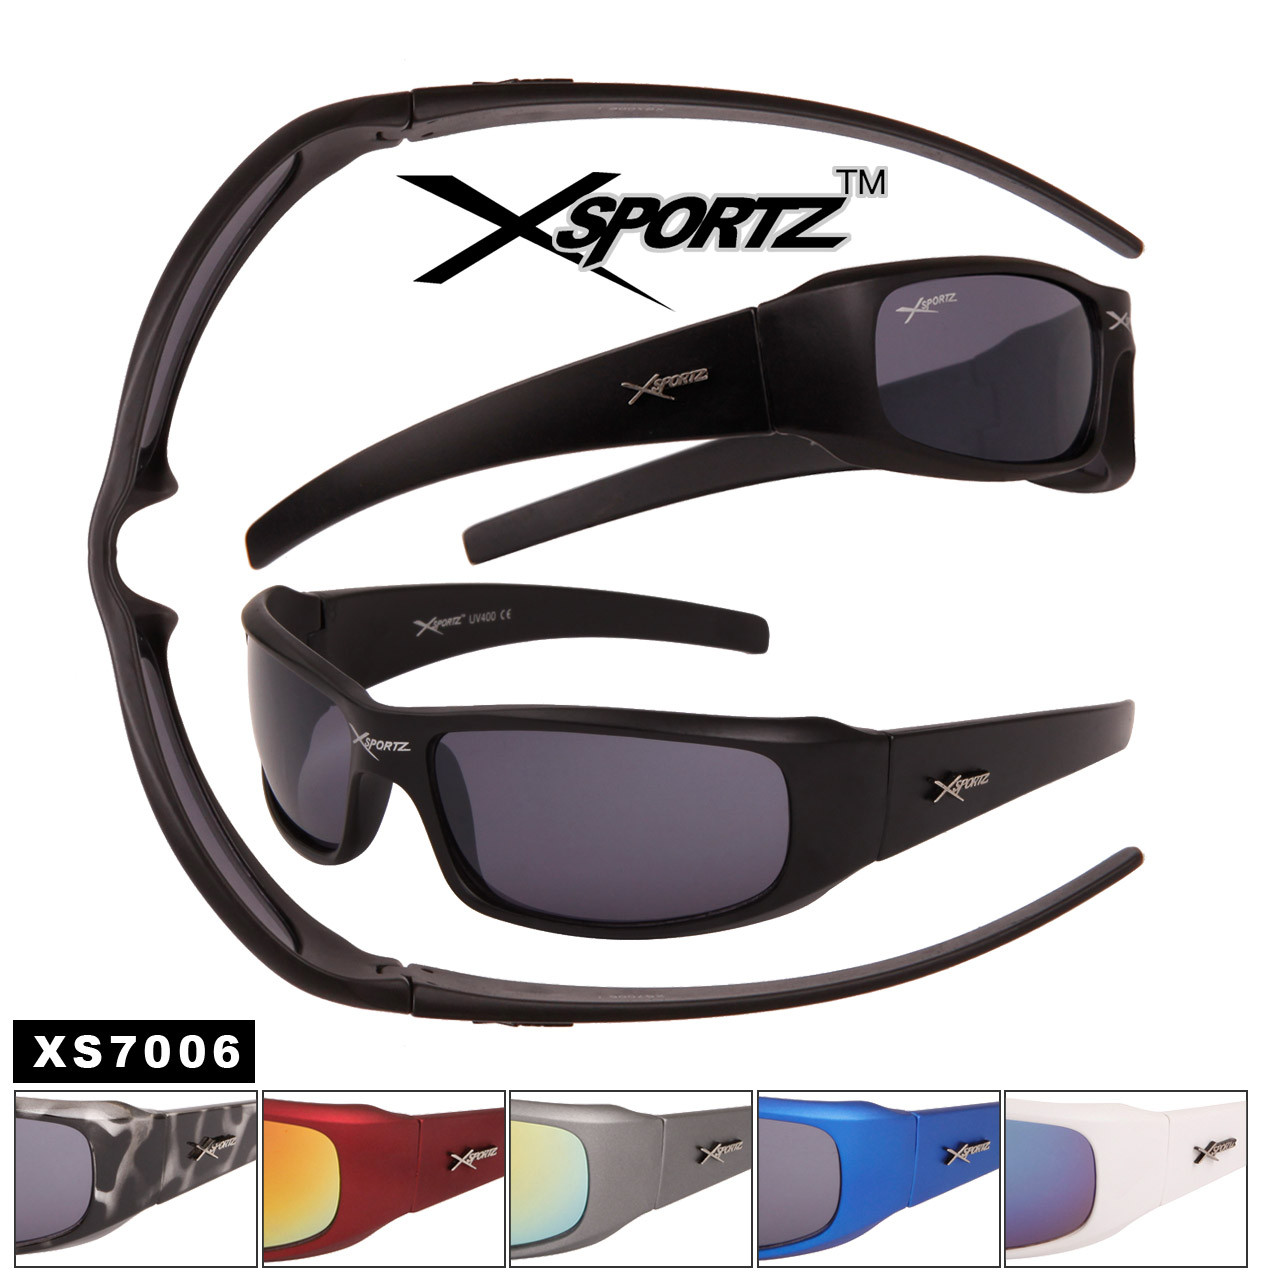 Xsportz™ Men's Sunglasses in Bulk - Style #XS7006